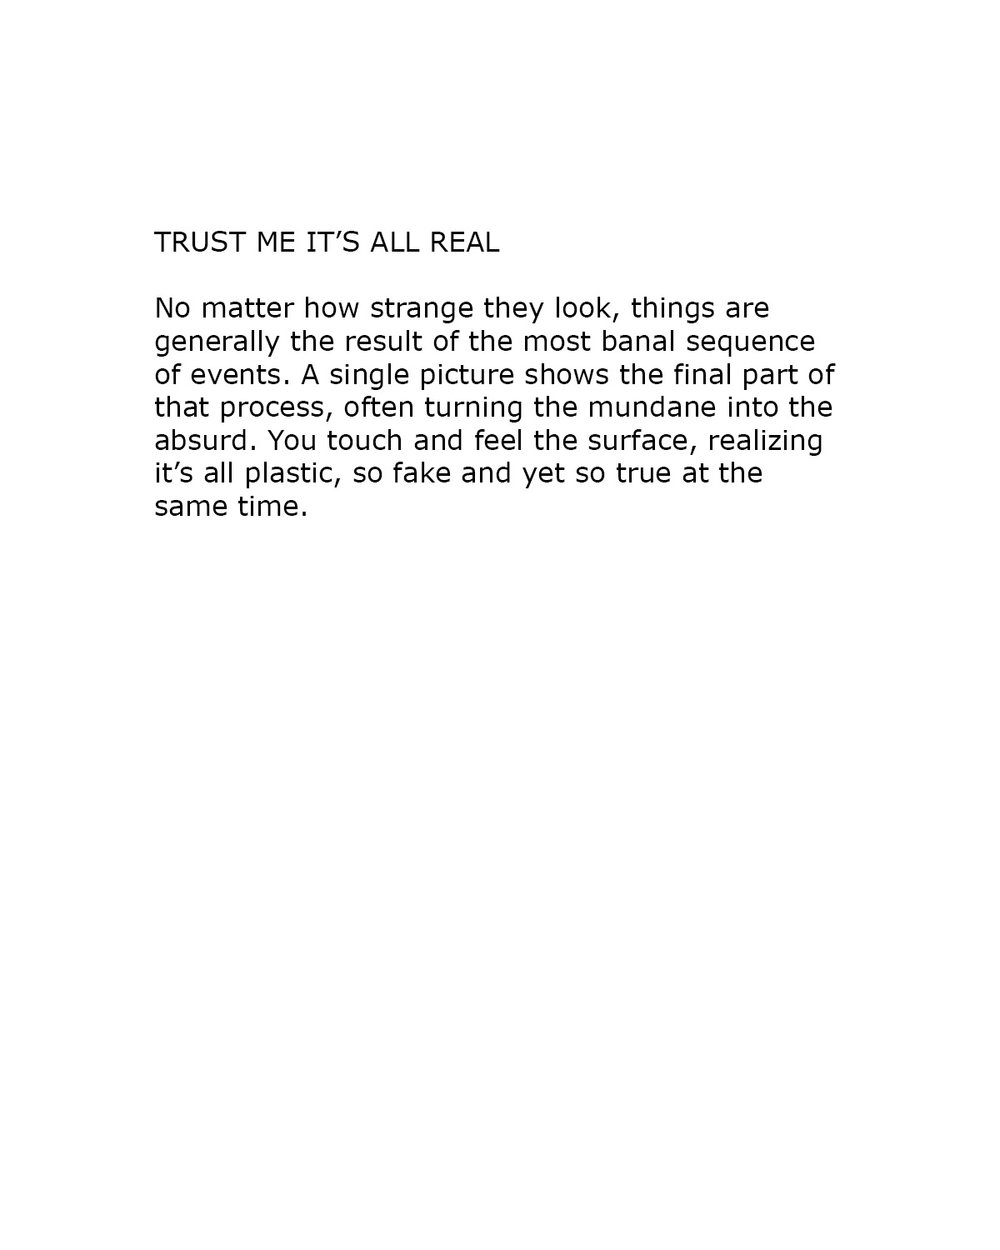 trust me 000.jpg